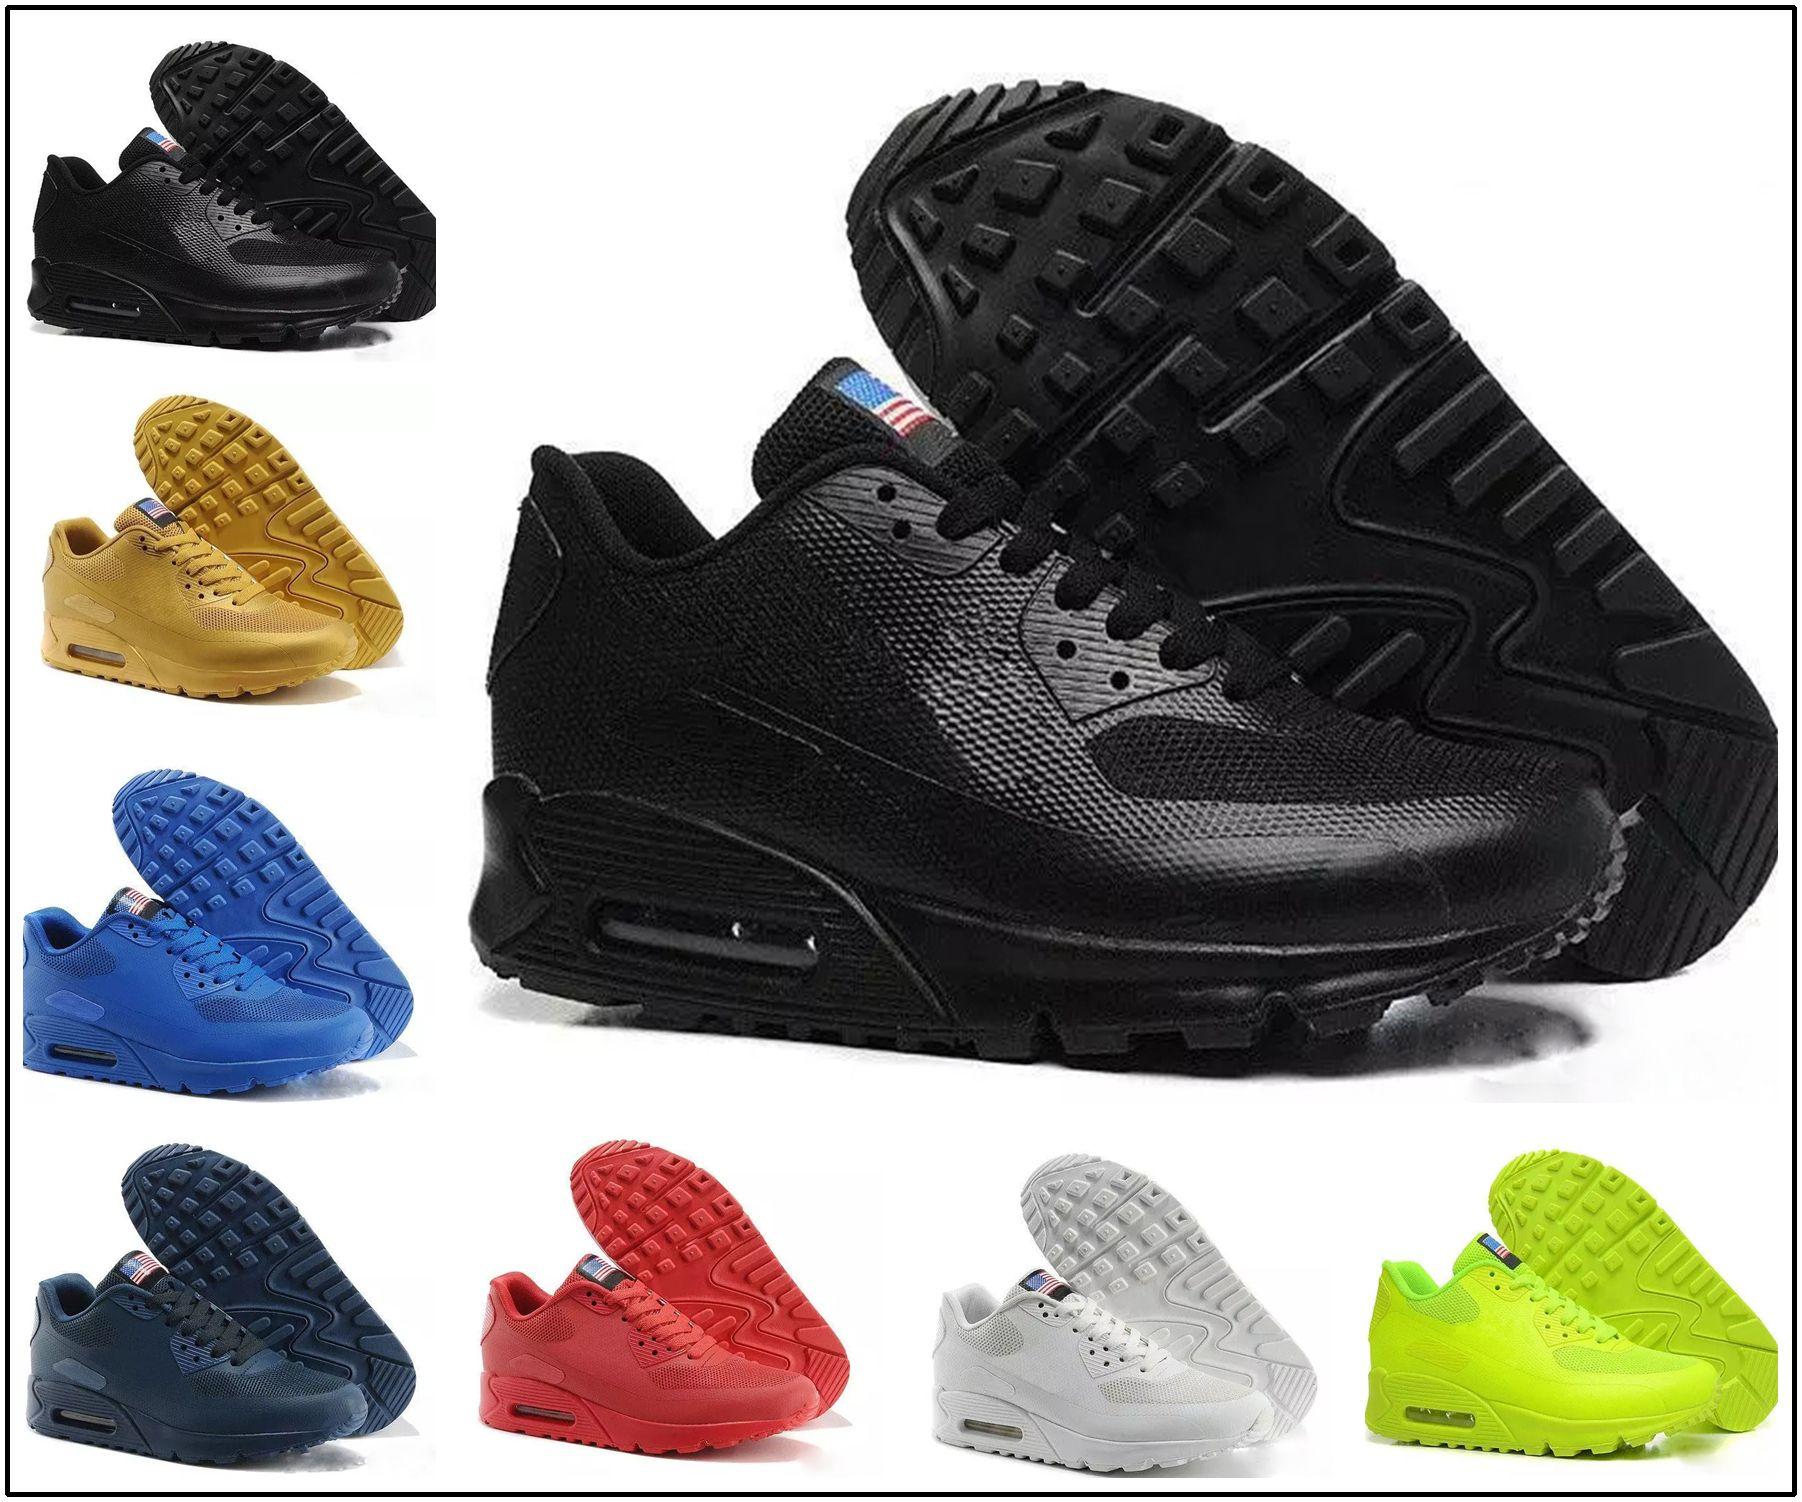 46a76cbb8a124 Compre Nike Air Max 90 HYP PRM QS 2018 Alr 90 HYP PRM QS Hombres Mujeres  Zapatillas De Running Alr 90s Bandera Americana Negro Blanco Azul Marino  Dorado ...